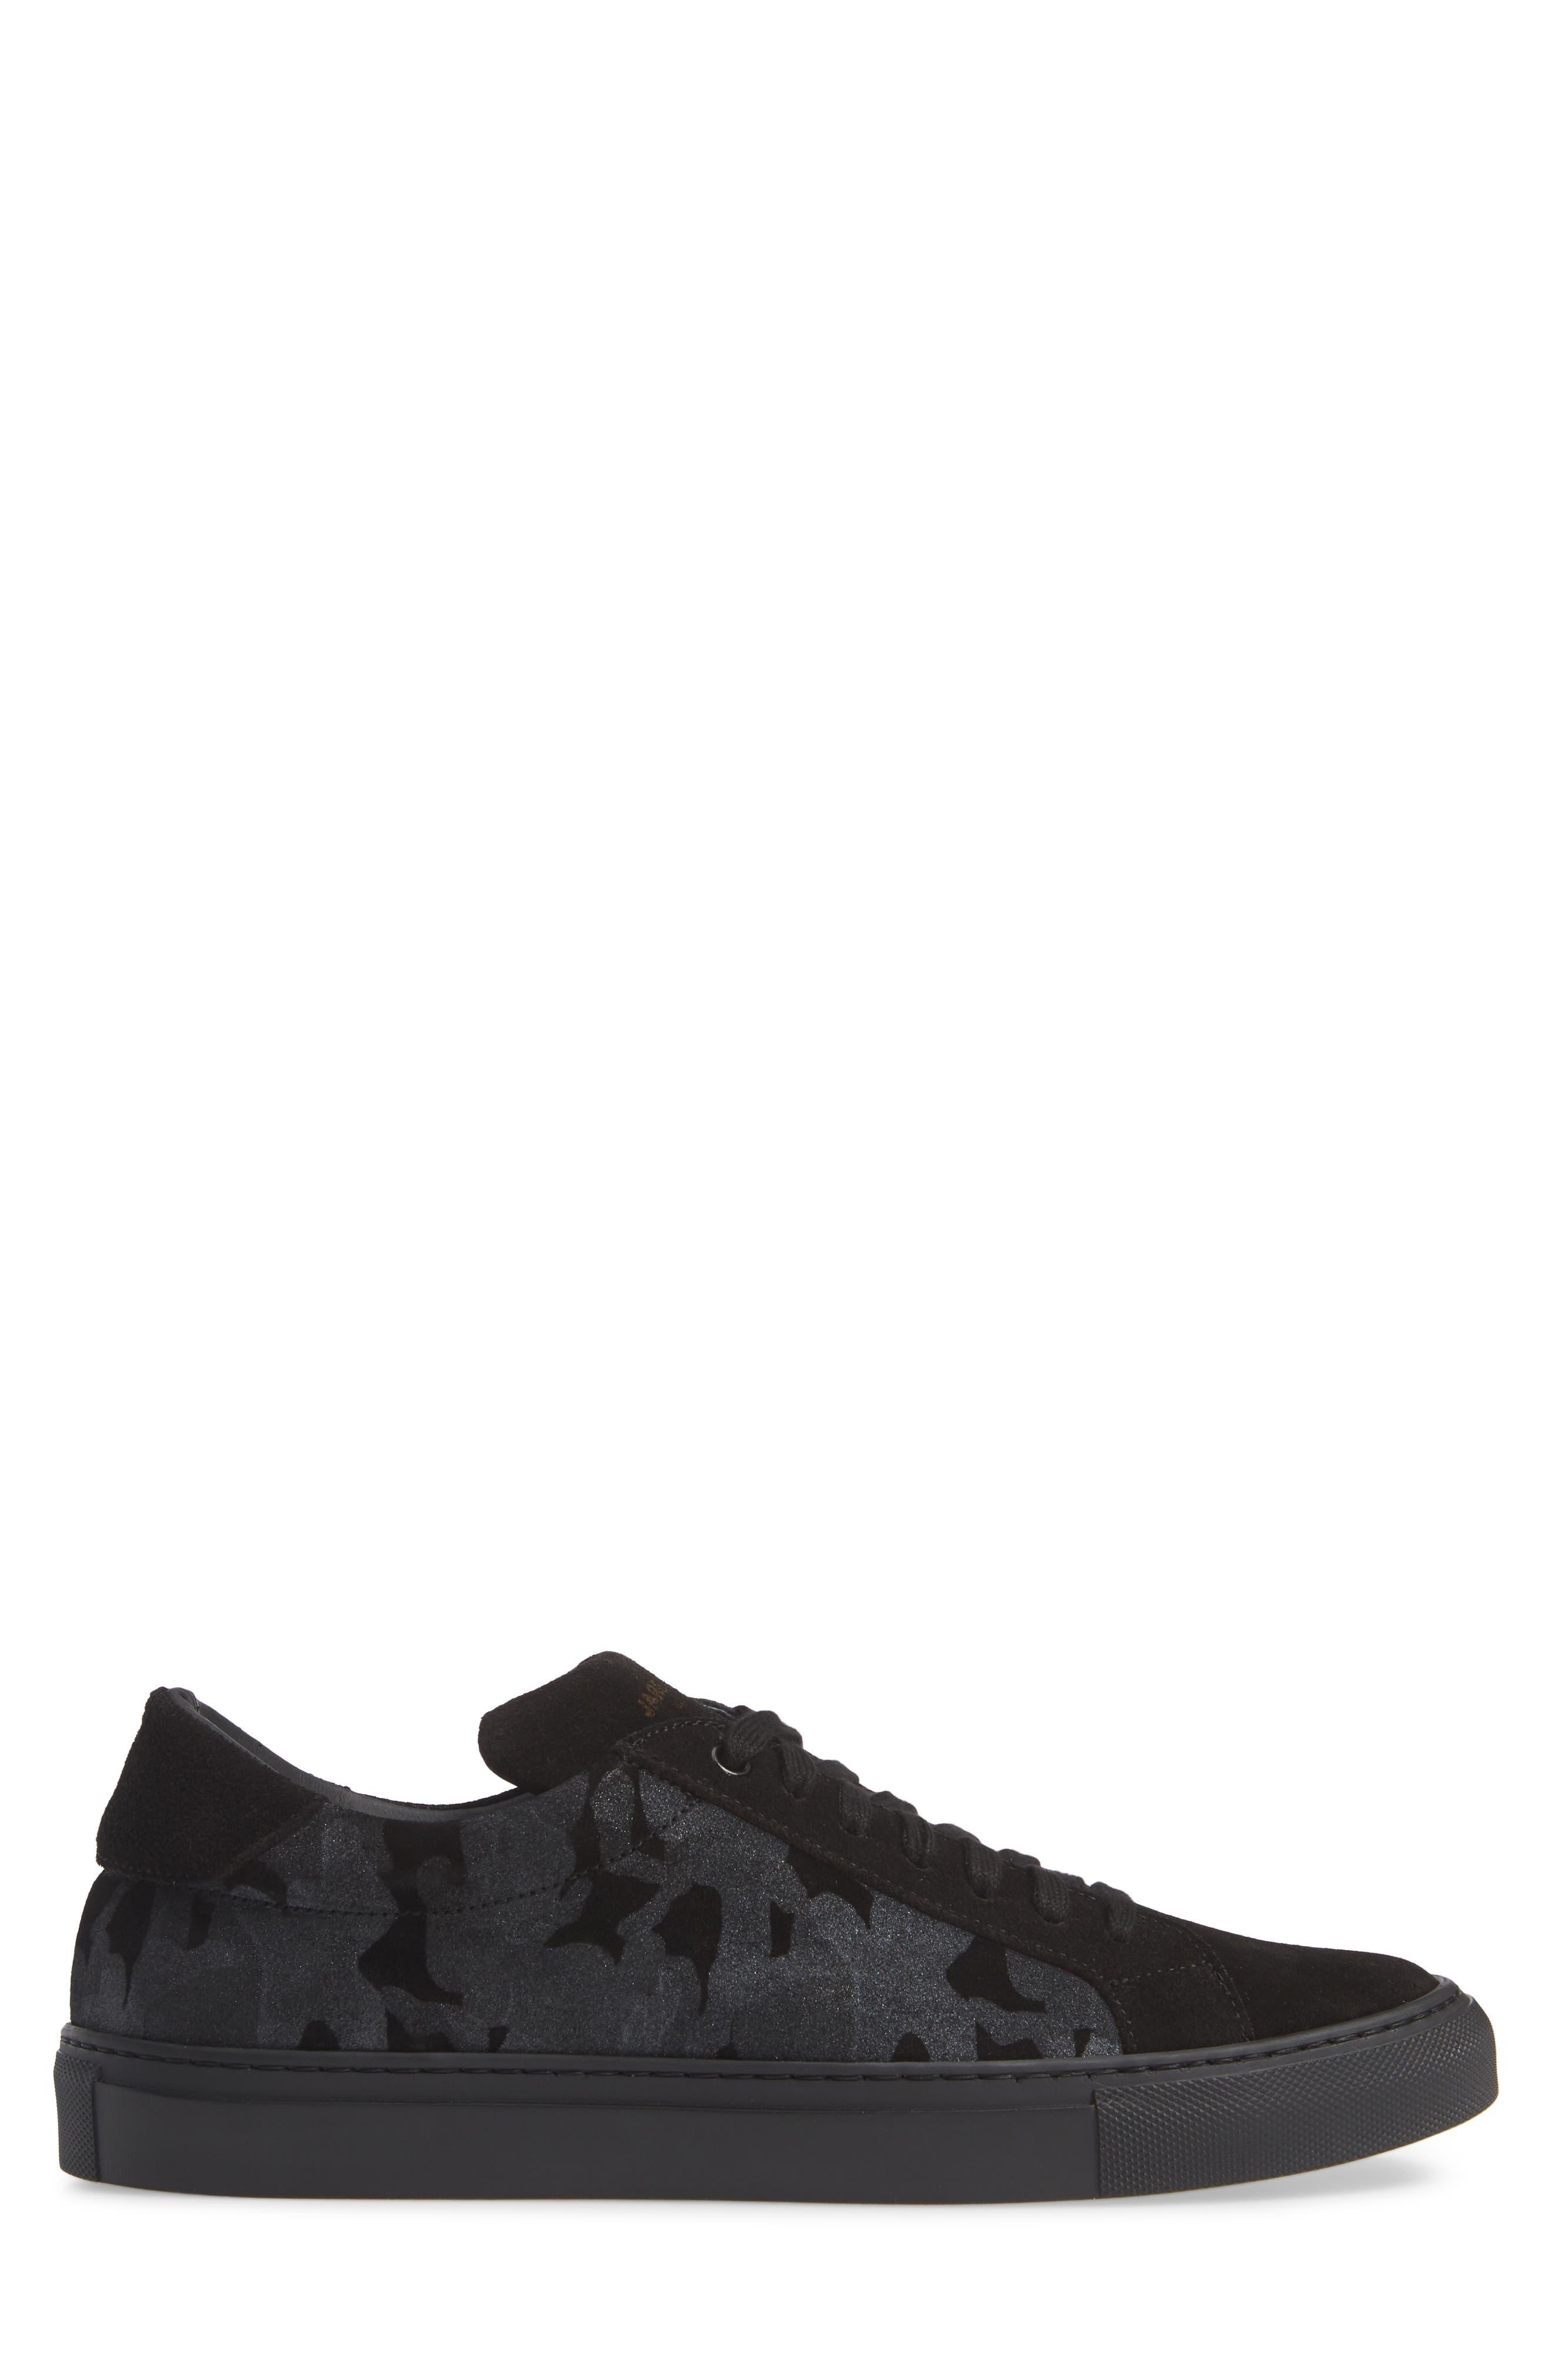 Rome Sneaker,                             Alternate thumbnail 3, color,                             BLACK